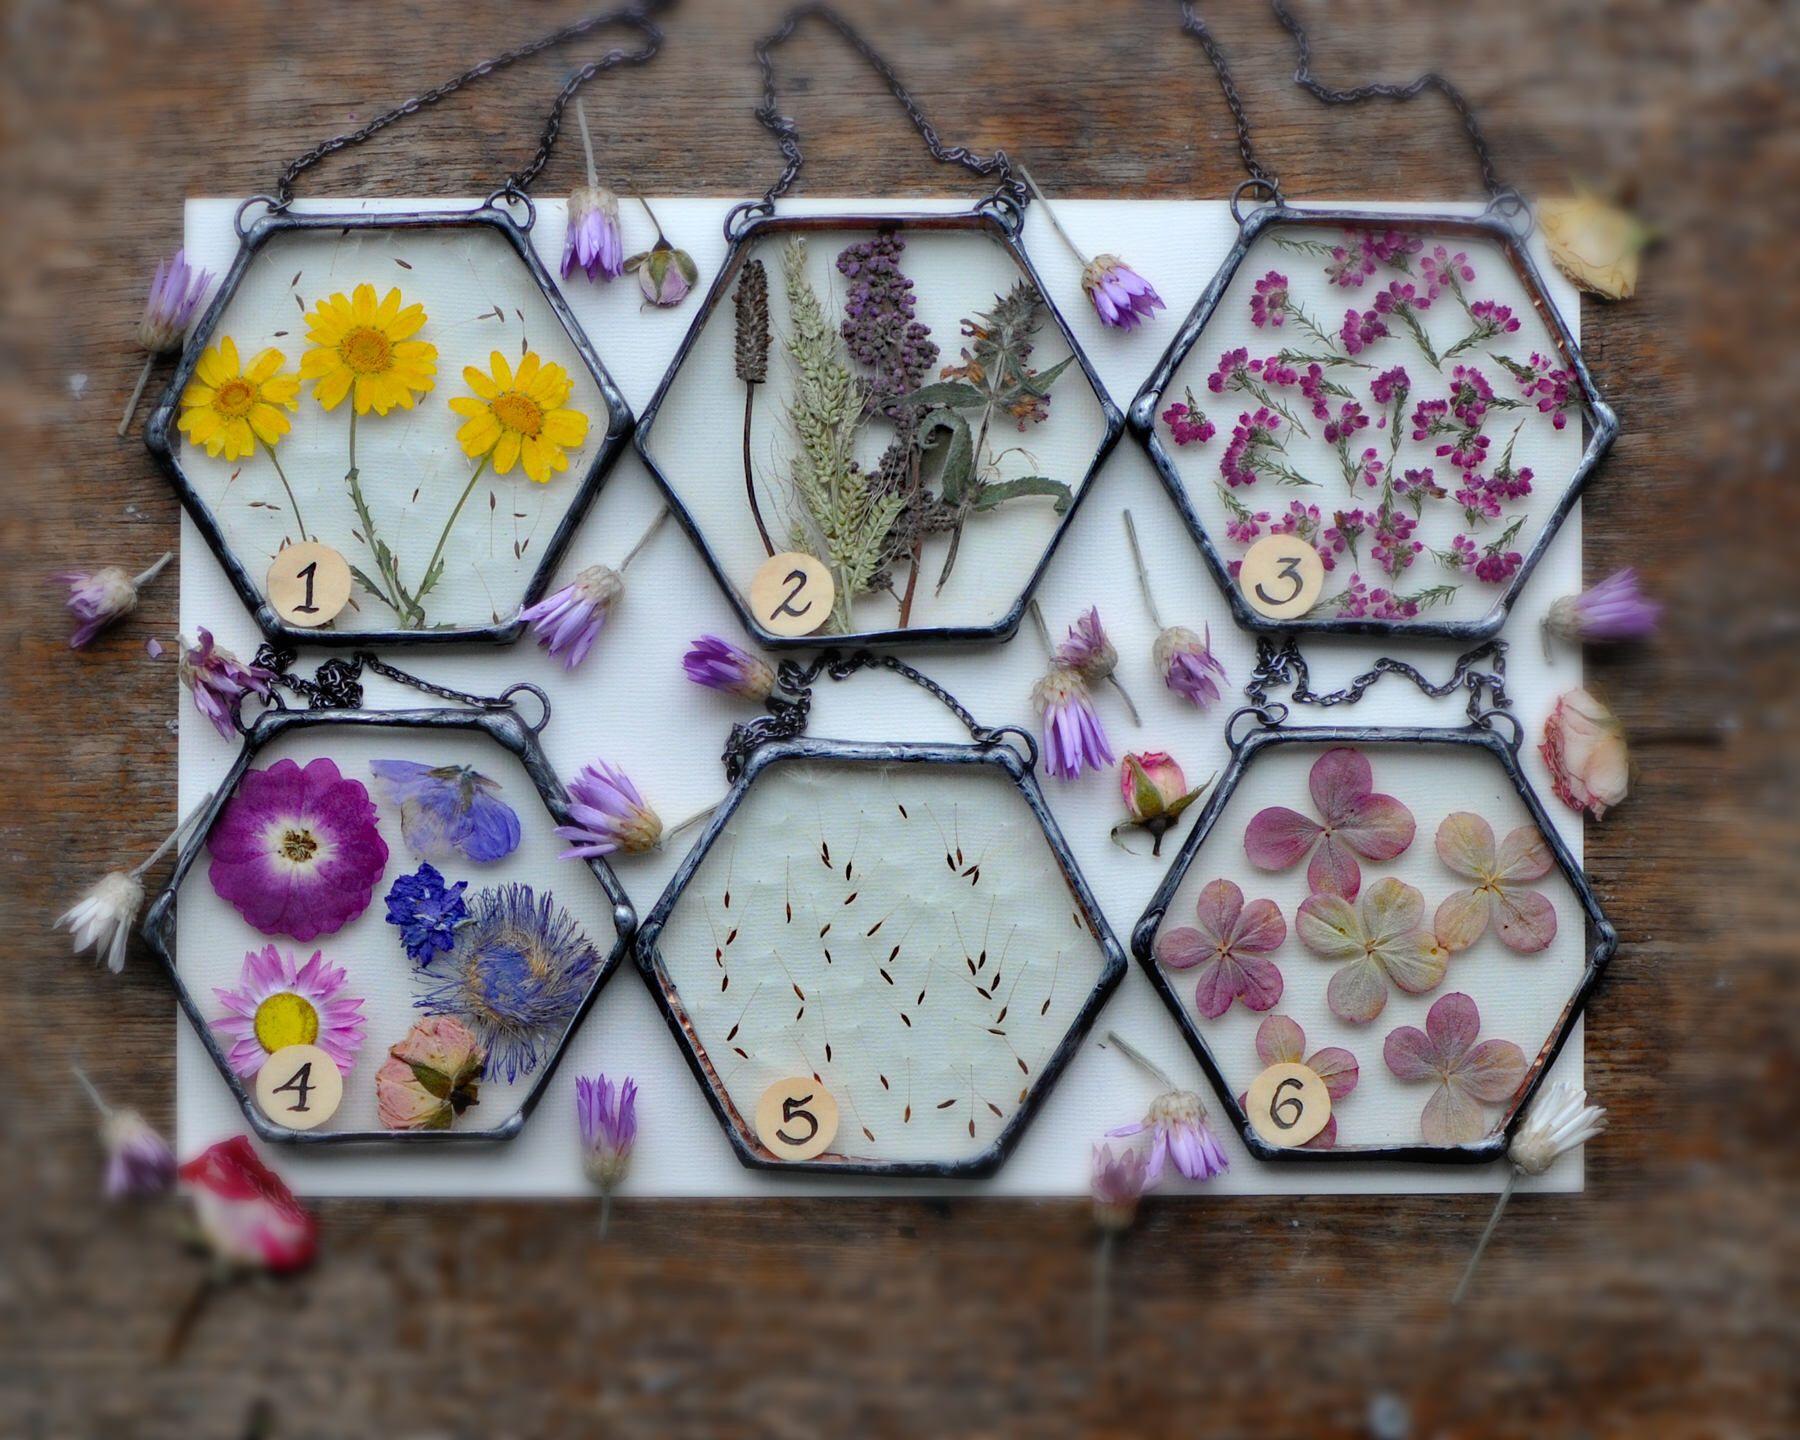 Gepresste Blumen, Luftpflanzenterrarium, Geschenk, hängendes Terrarium, Luftpflanzenterrarium, Wohnkultur, Terrariendekor, Glasmalerei